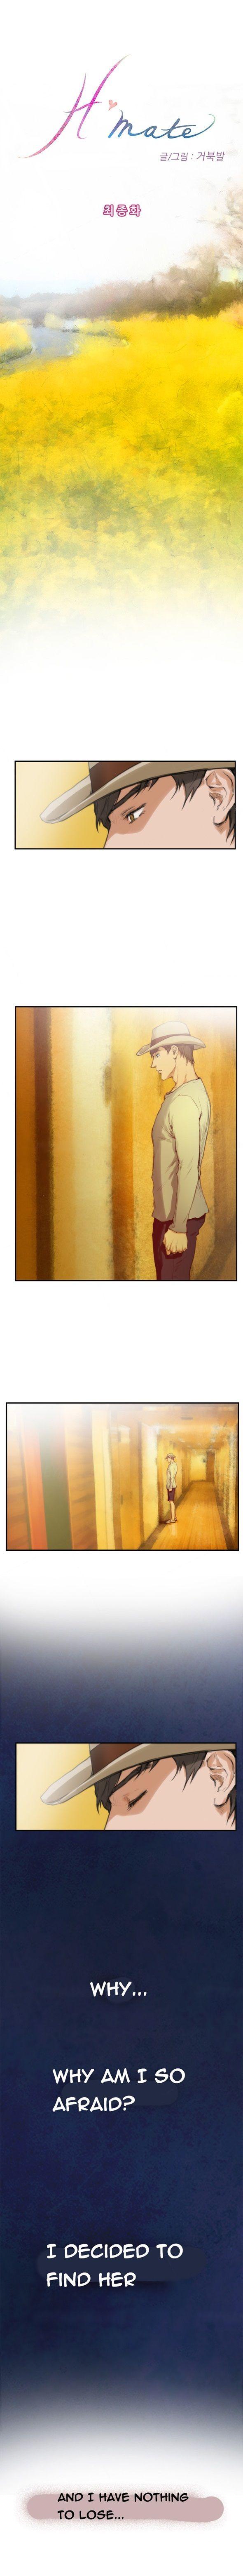 https://im.nineanime.com/comics/pic9/49/1393/331956/HMate930176.jpg Page 1